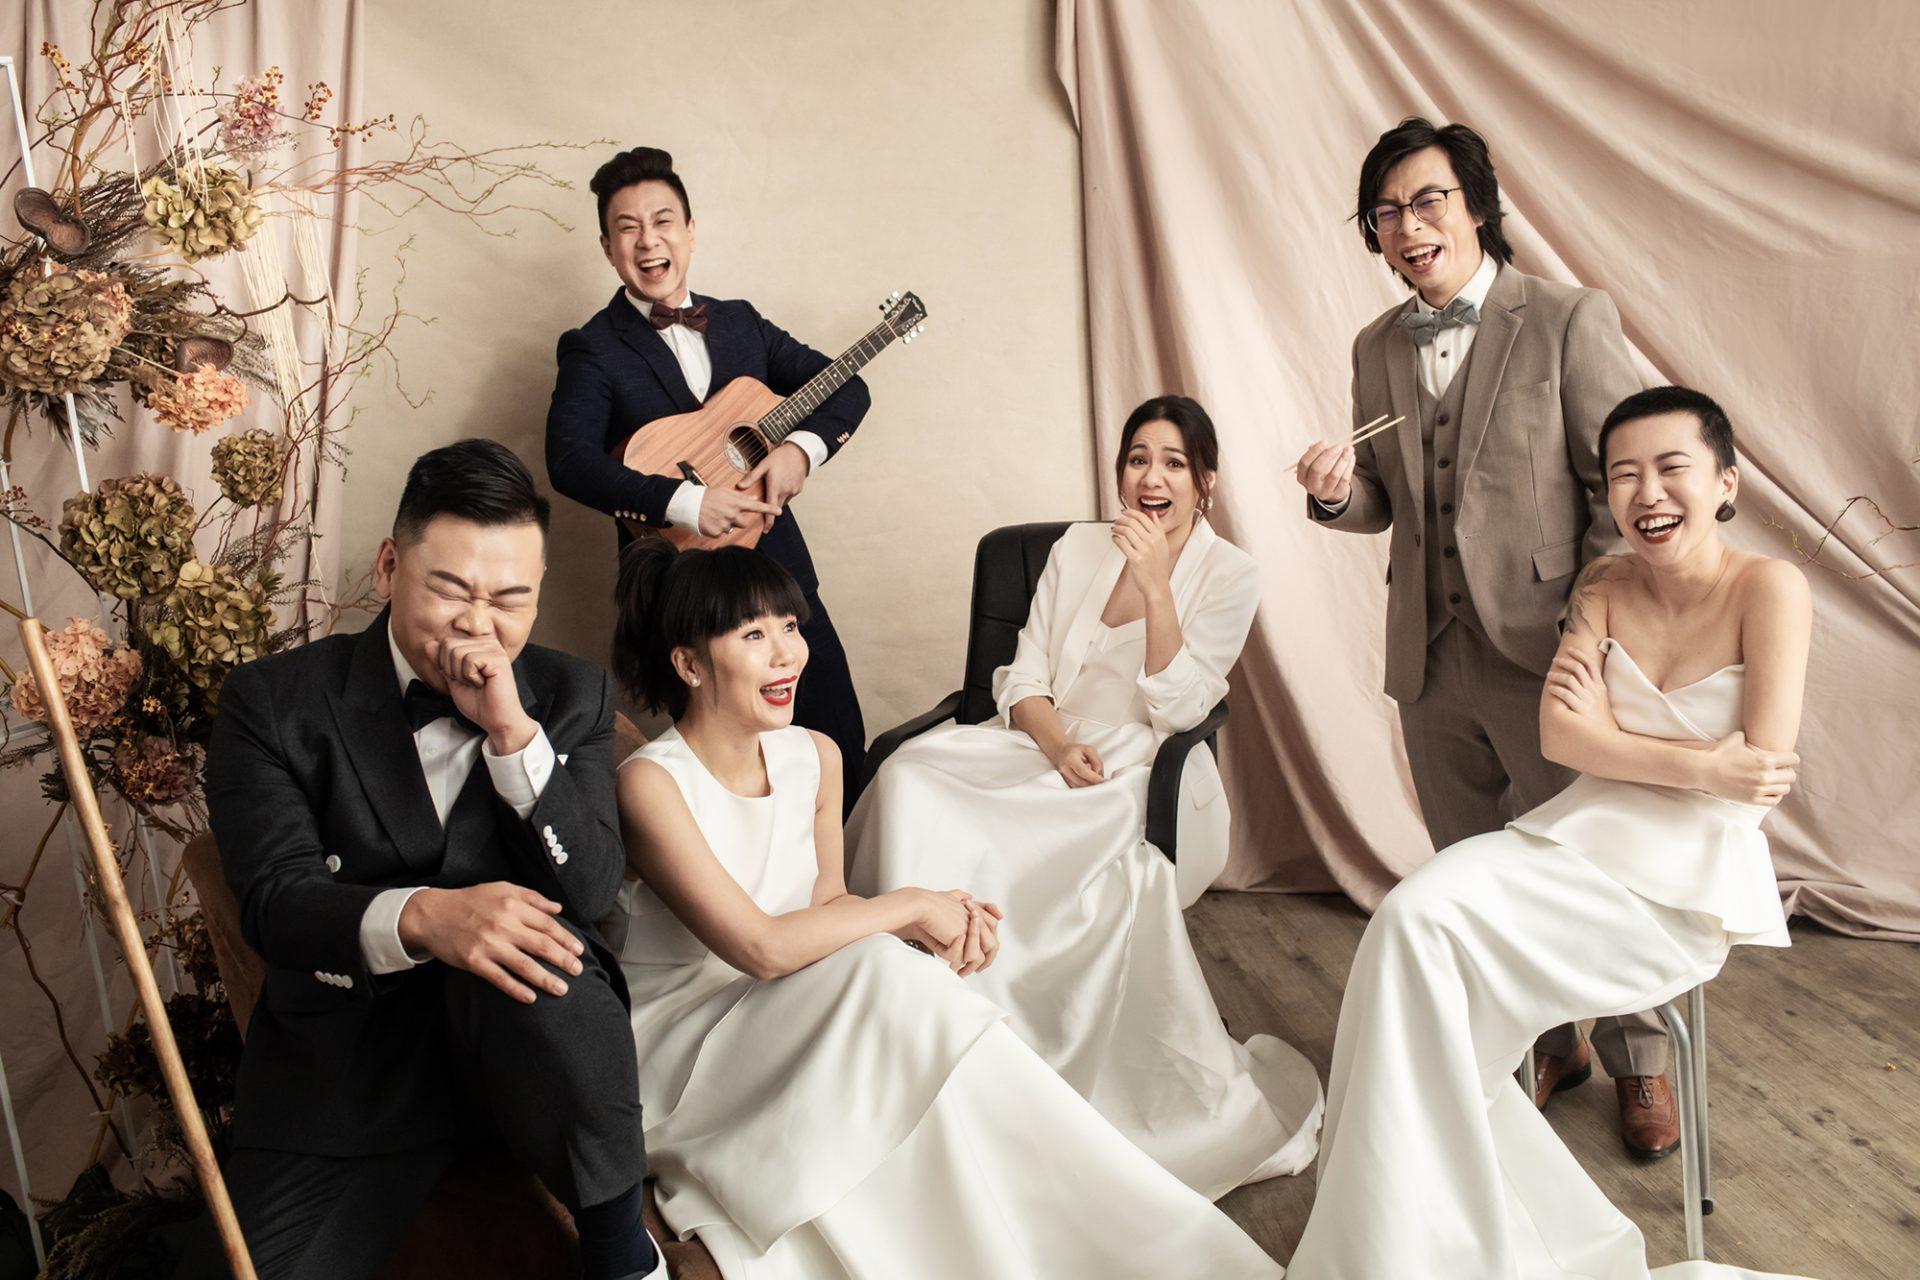 Cover Story of Wedding Magazine |韋羅莎・白只・朱栢康